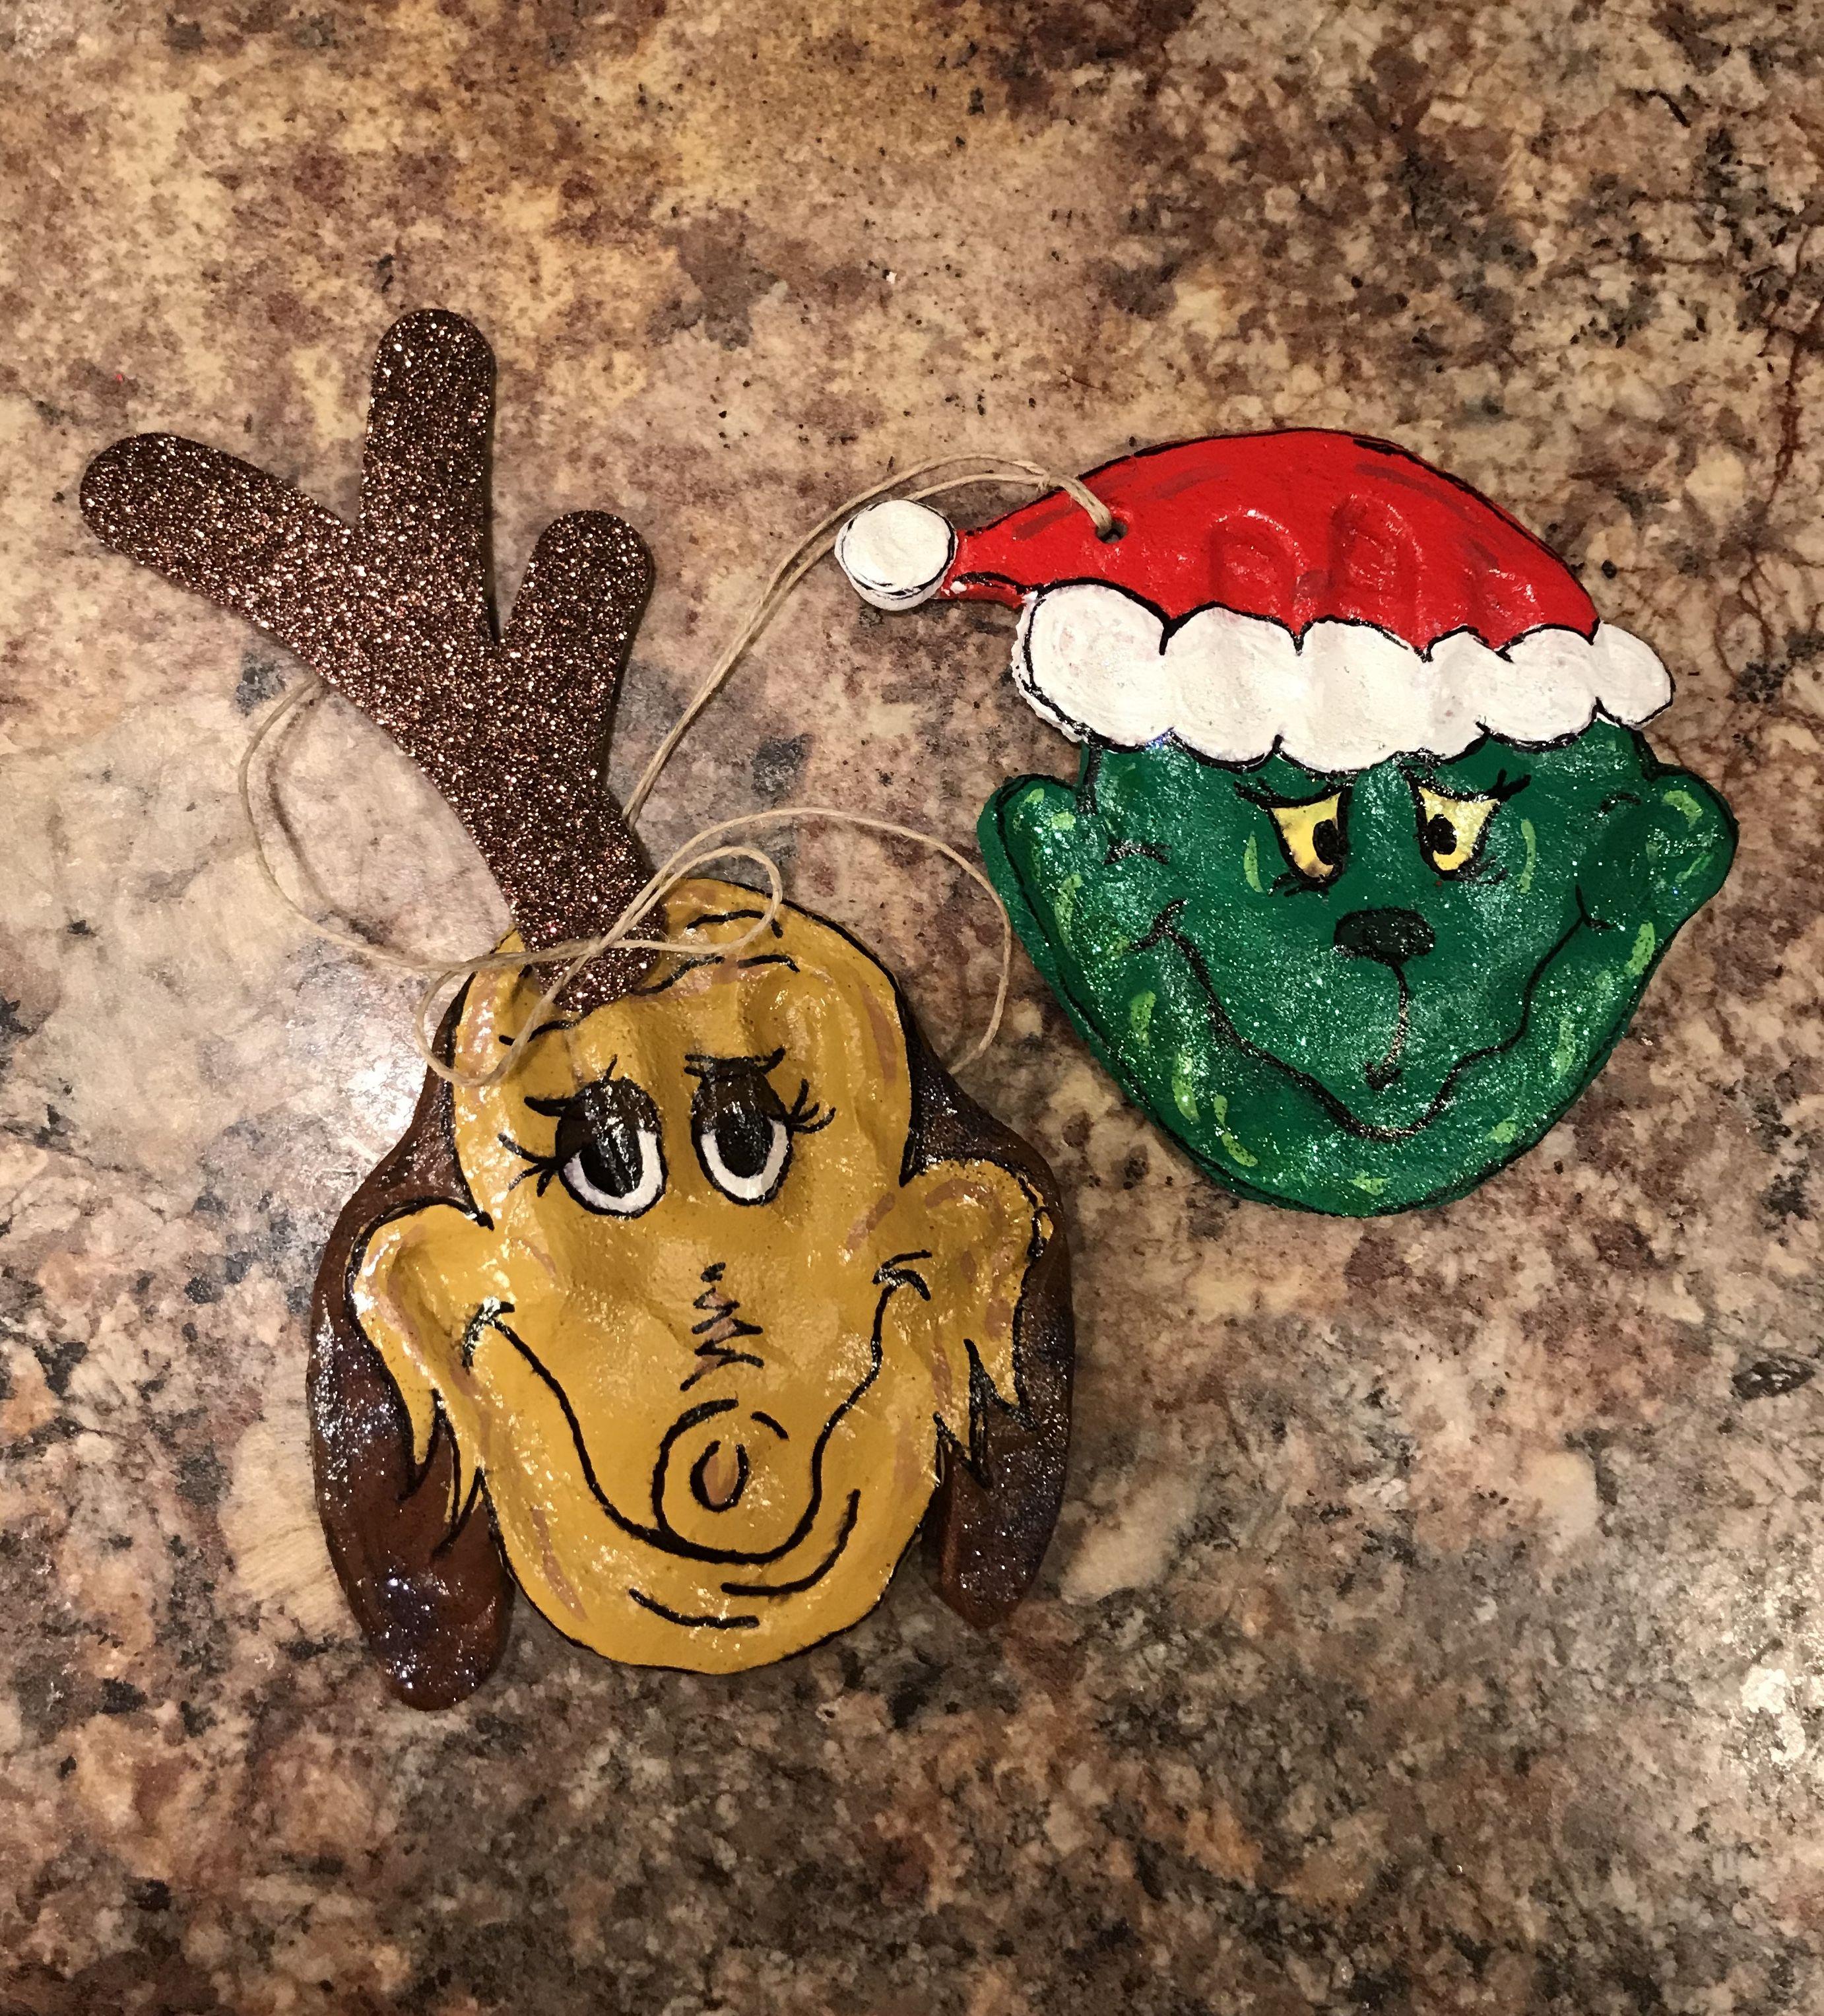 The Grinch And Max Handprint Salt Dough Ornaments Grinch Ornaments Salt Dough Ornaments Handprint Ornaments